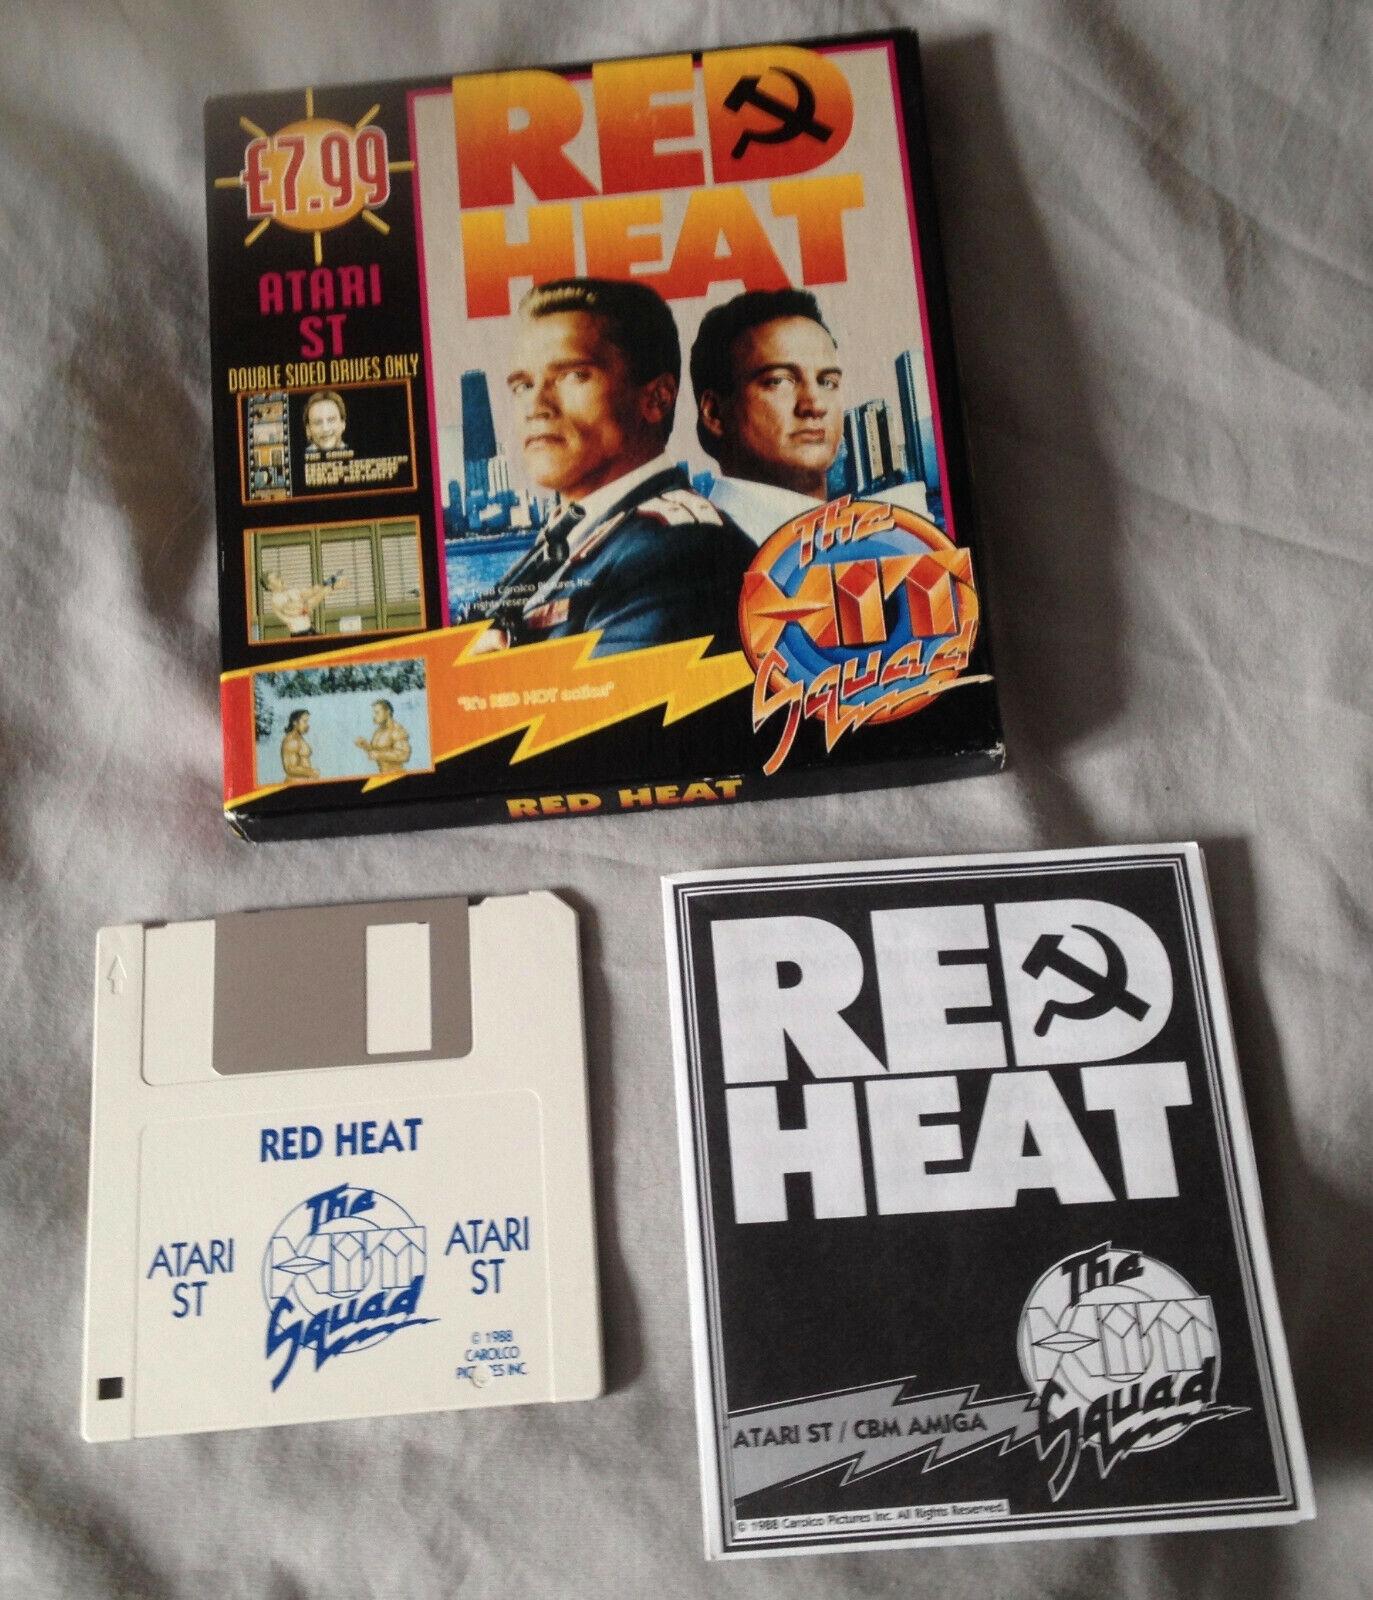 retro computer games - RED HEAT Atari STe ST video computer game 1988 retro vintage floppy disk disc